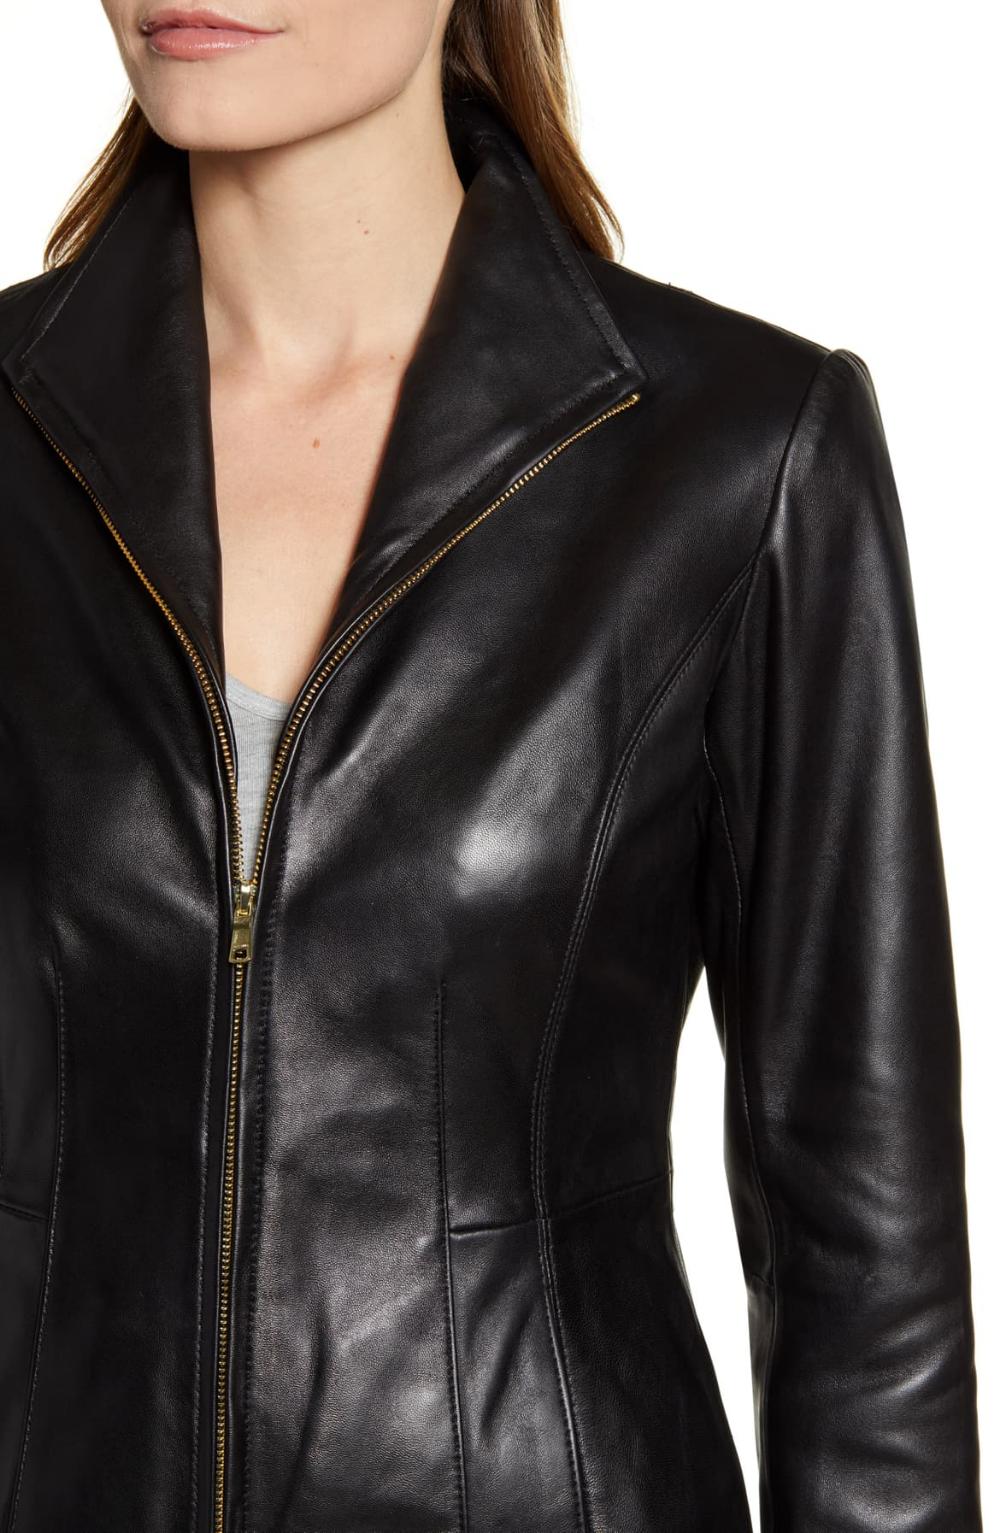 Cole Haan Lambskin Leather Jacket Nordstrom Lambskin Leather Jacket Leather Jacket Leather Coat Jacket [ 1533 x 1000 Pixel ]